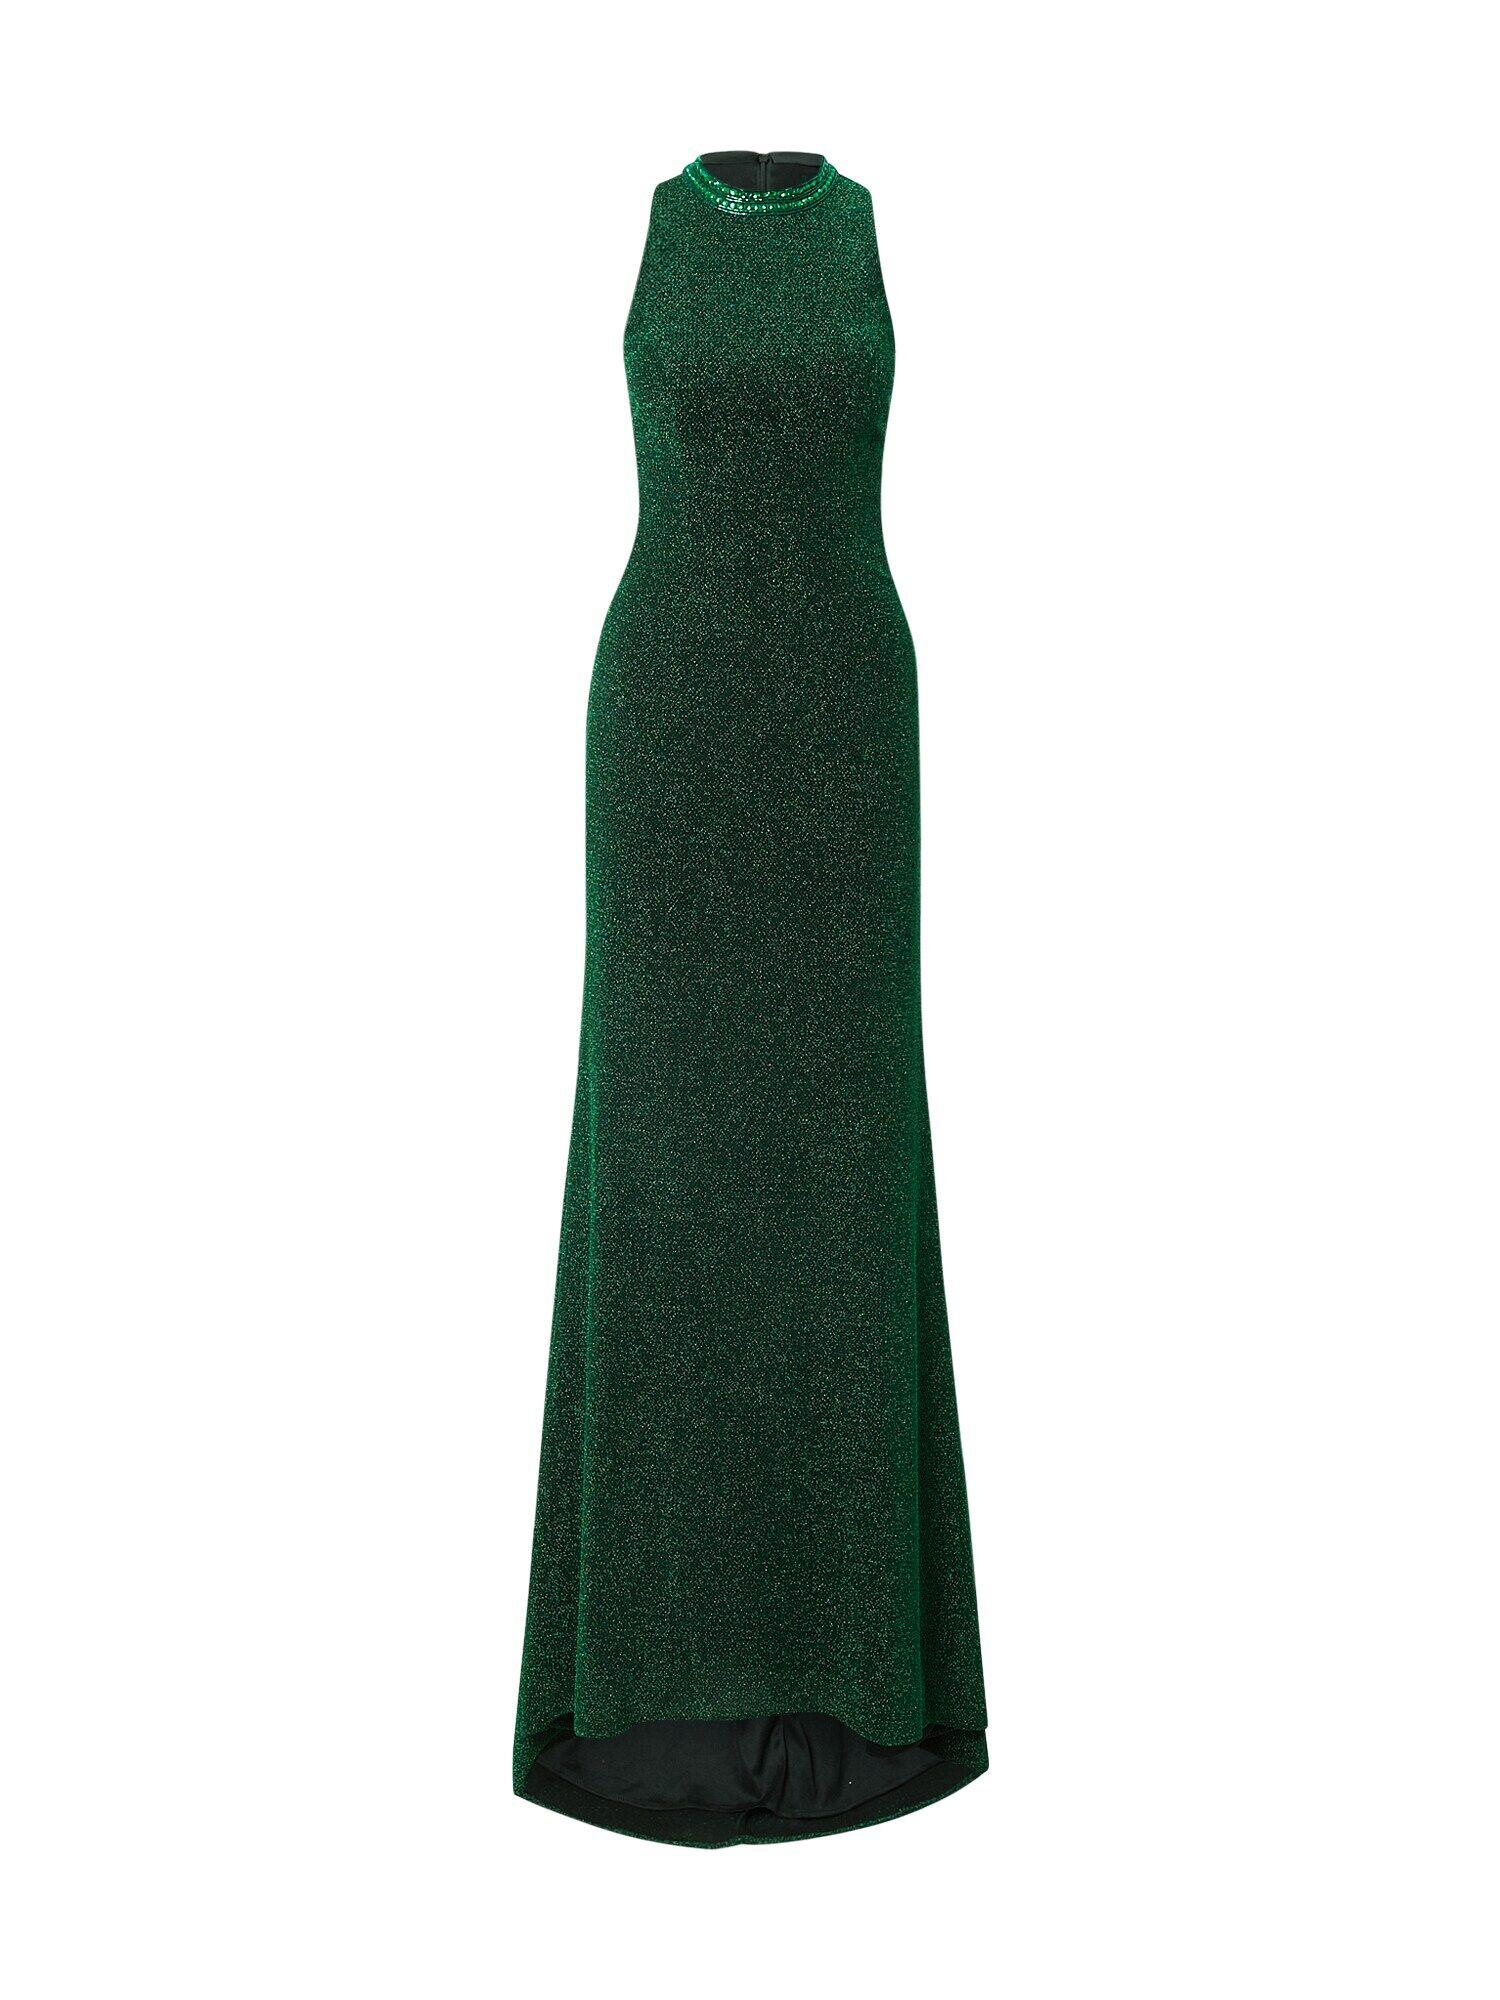 mascara Robe de soirée  - Vert - Taille: 34 - female